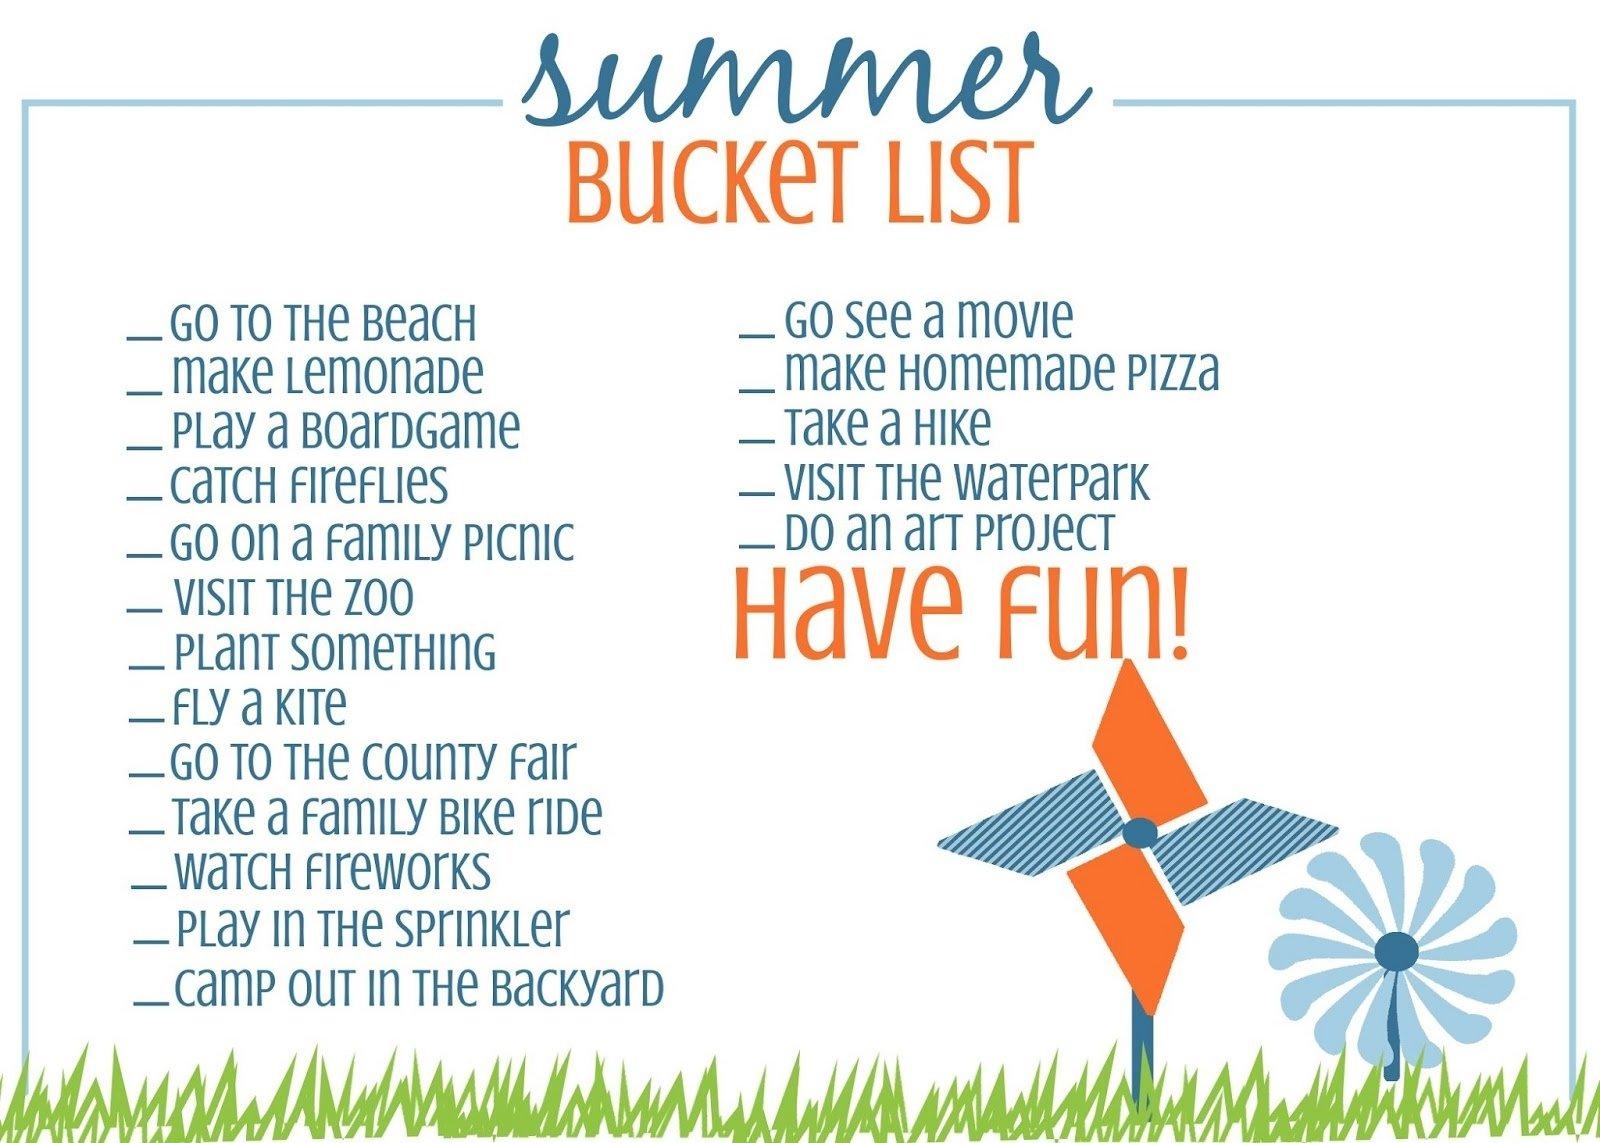 10 Spectacular Bucket List Ideas For Girls 60 days of summer fun 4 the summer bucket list palnyc 2021